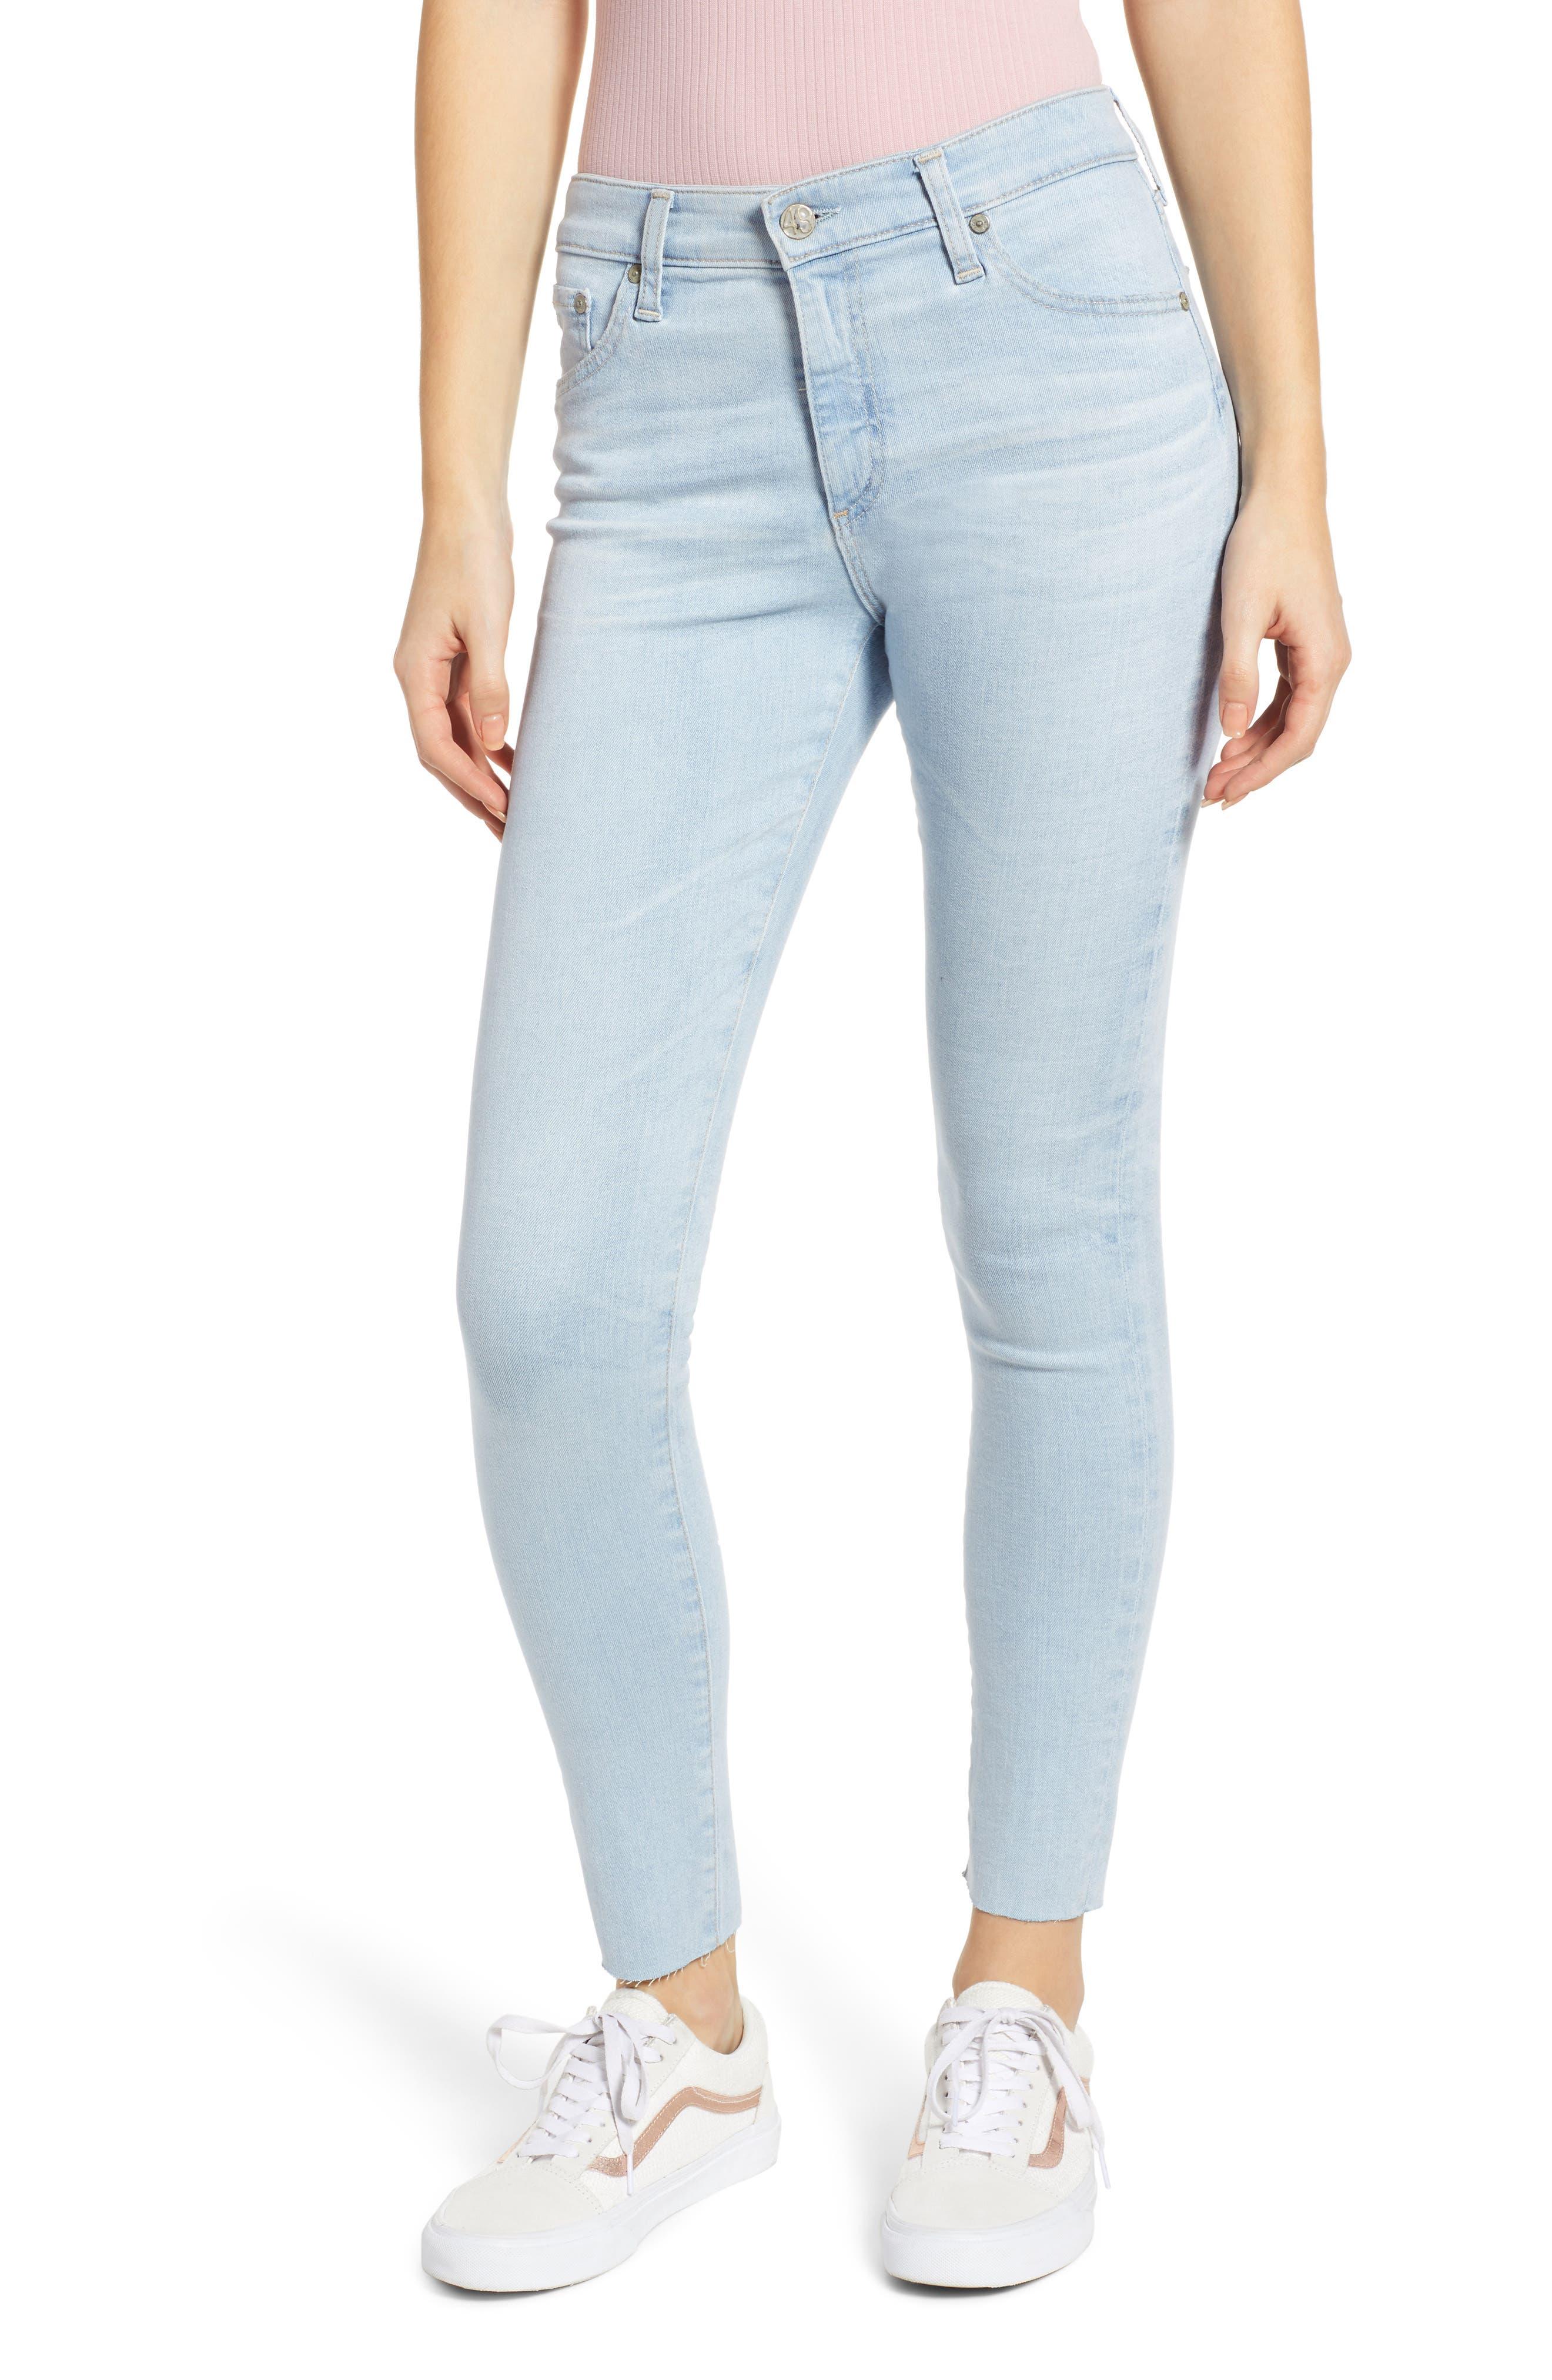 AG, The Farrah High Waist Ankle Skinny Jeans, Main thumbnail 1, color, 27 YEARS SHINING